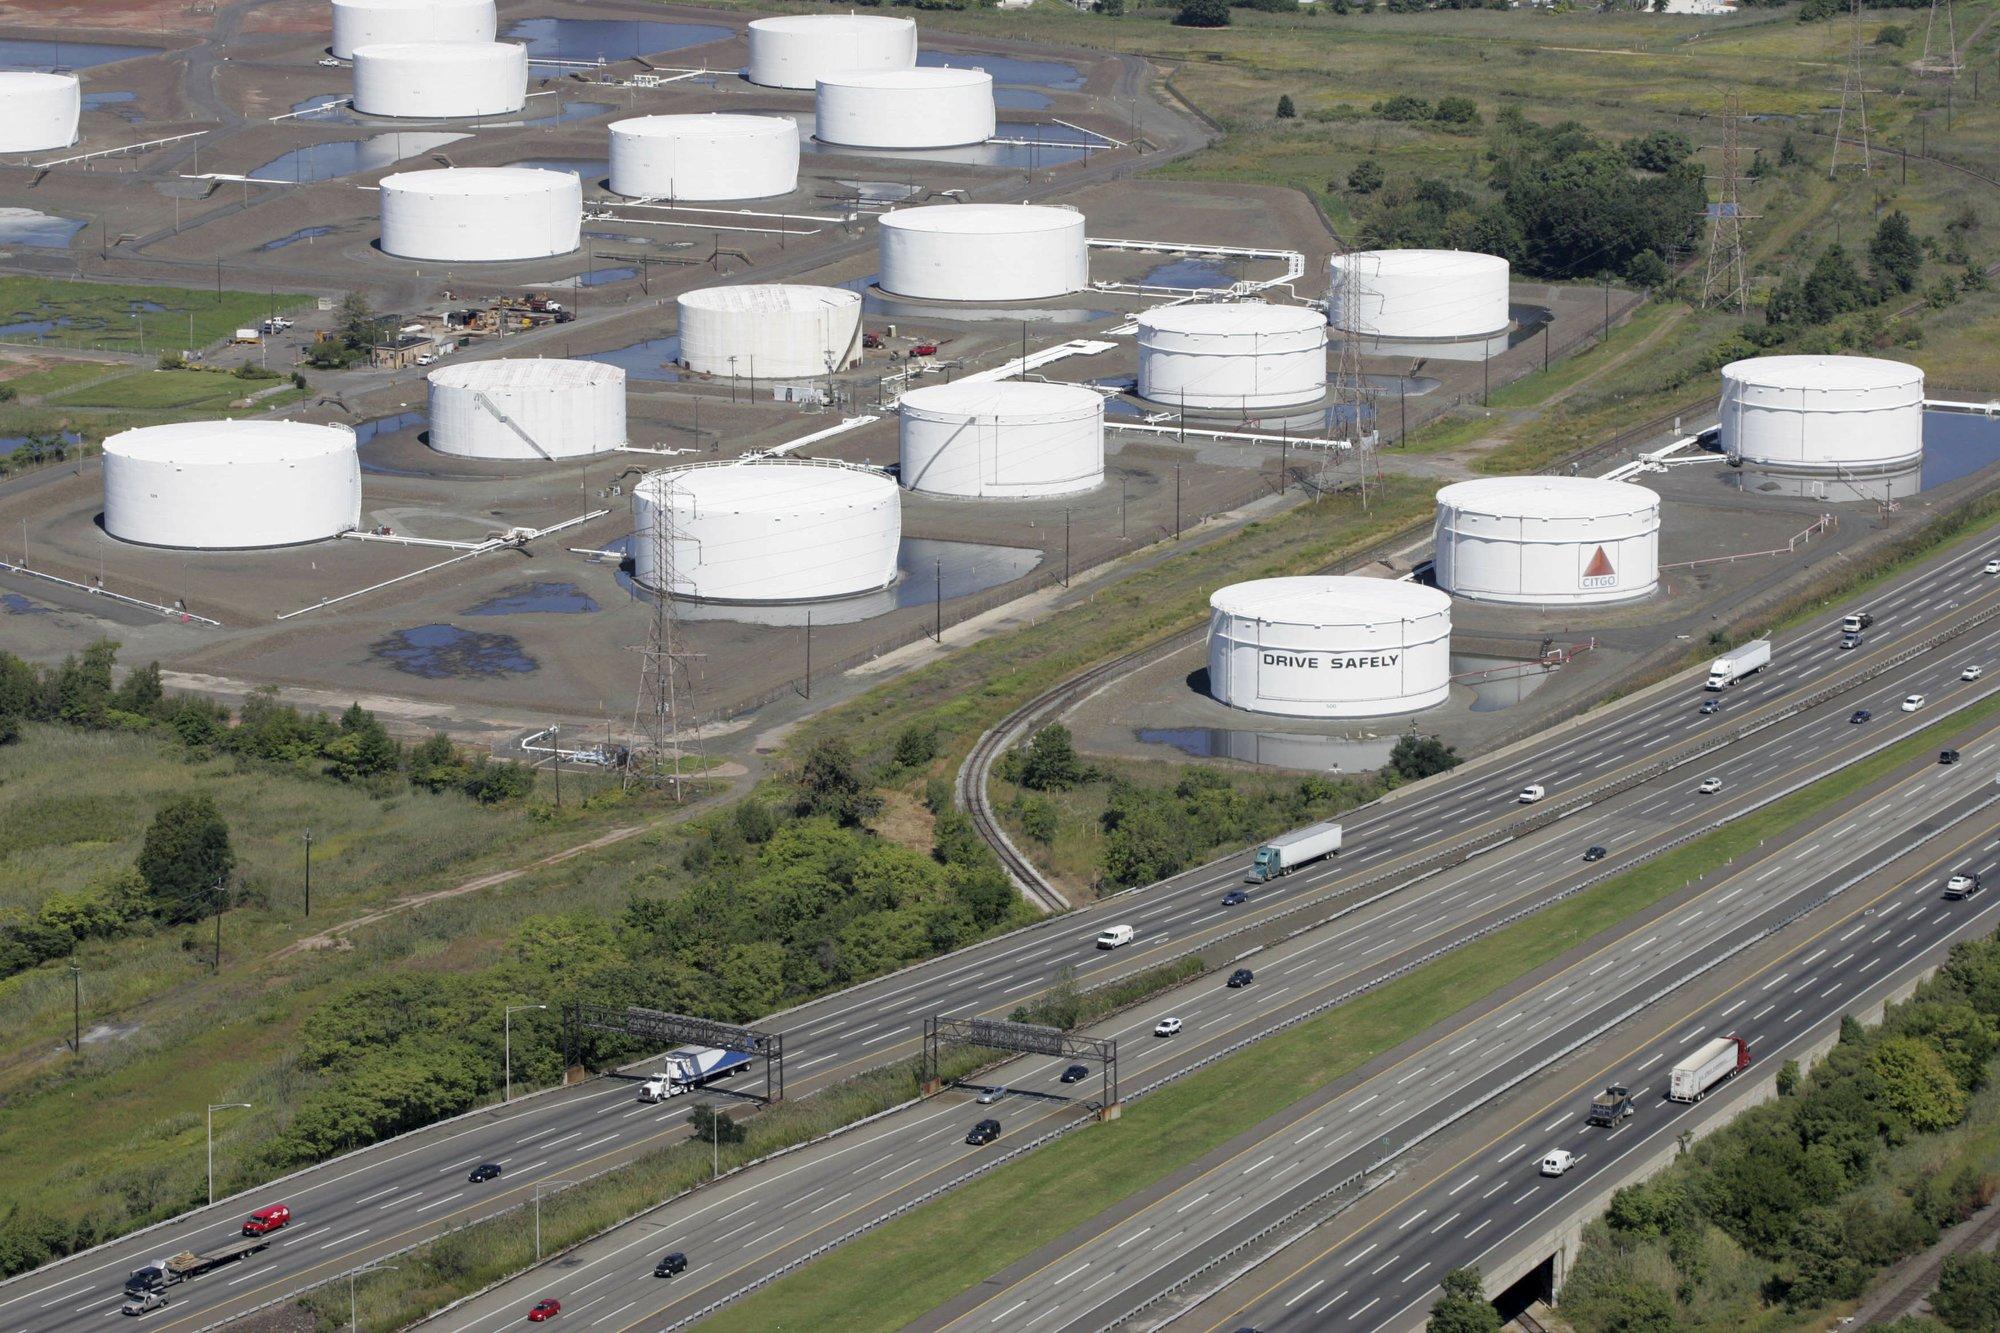 Venezuela holds onto prized US refineries amid legal battle